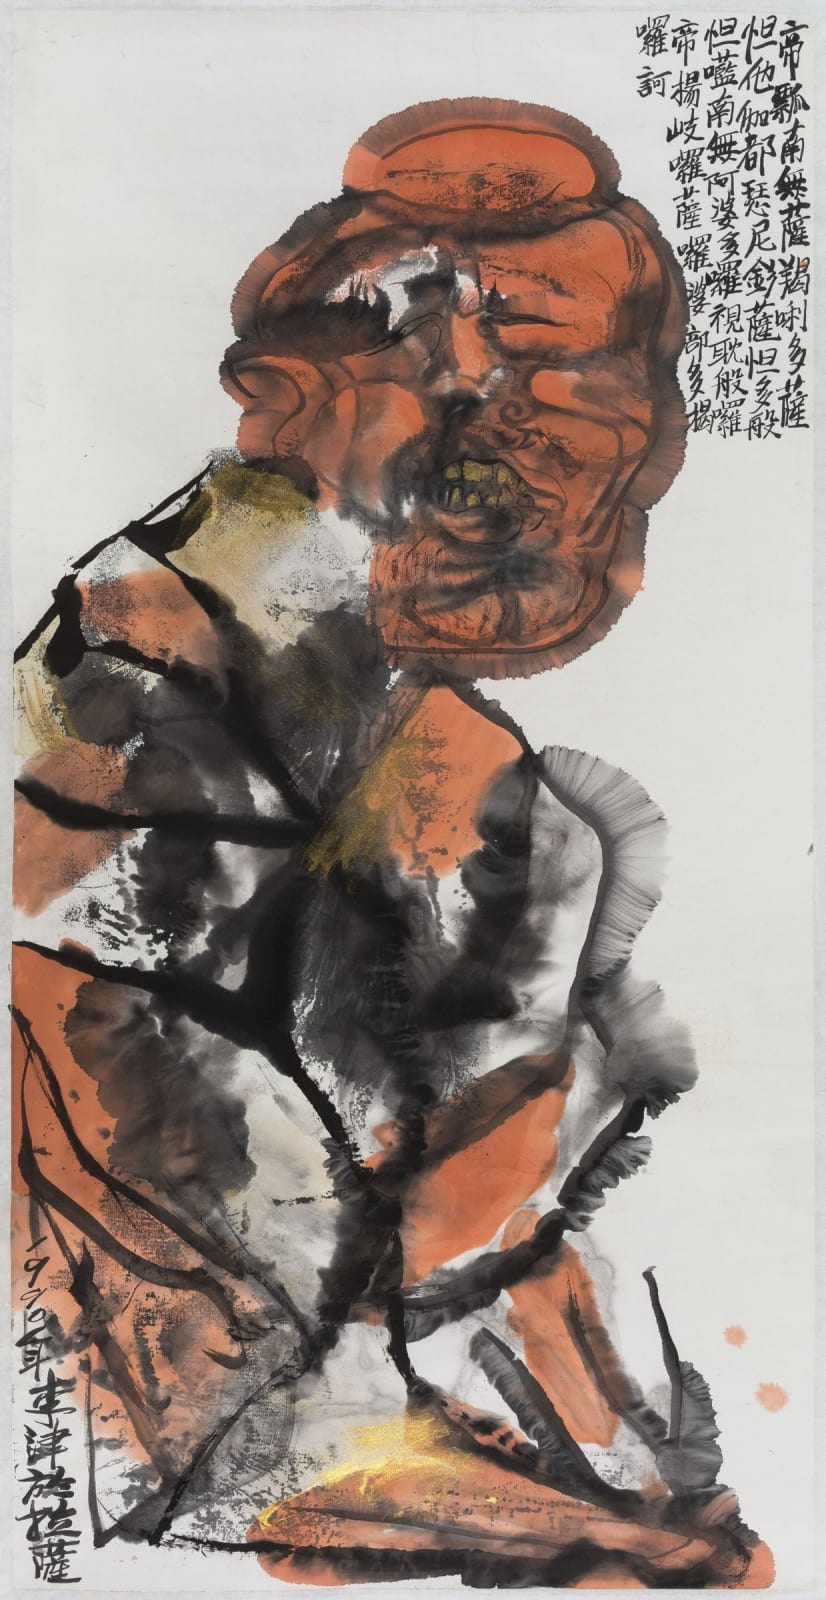 Li Jin 李津, Red-Robed Disciple 红衣头陀, 1992